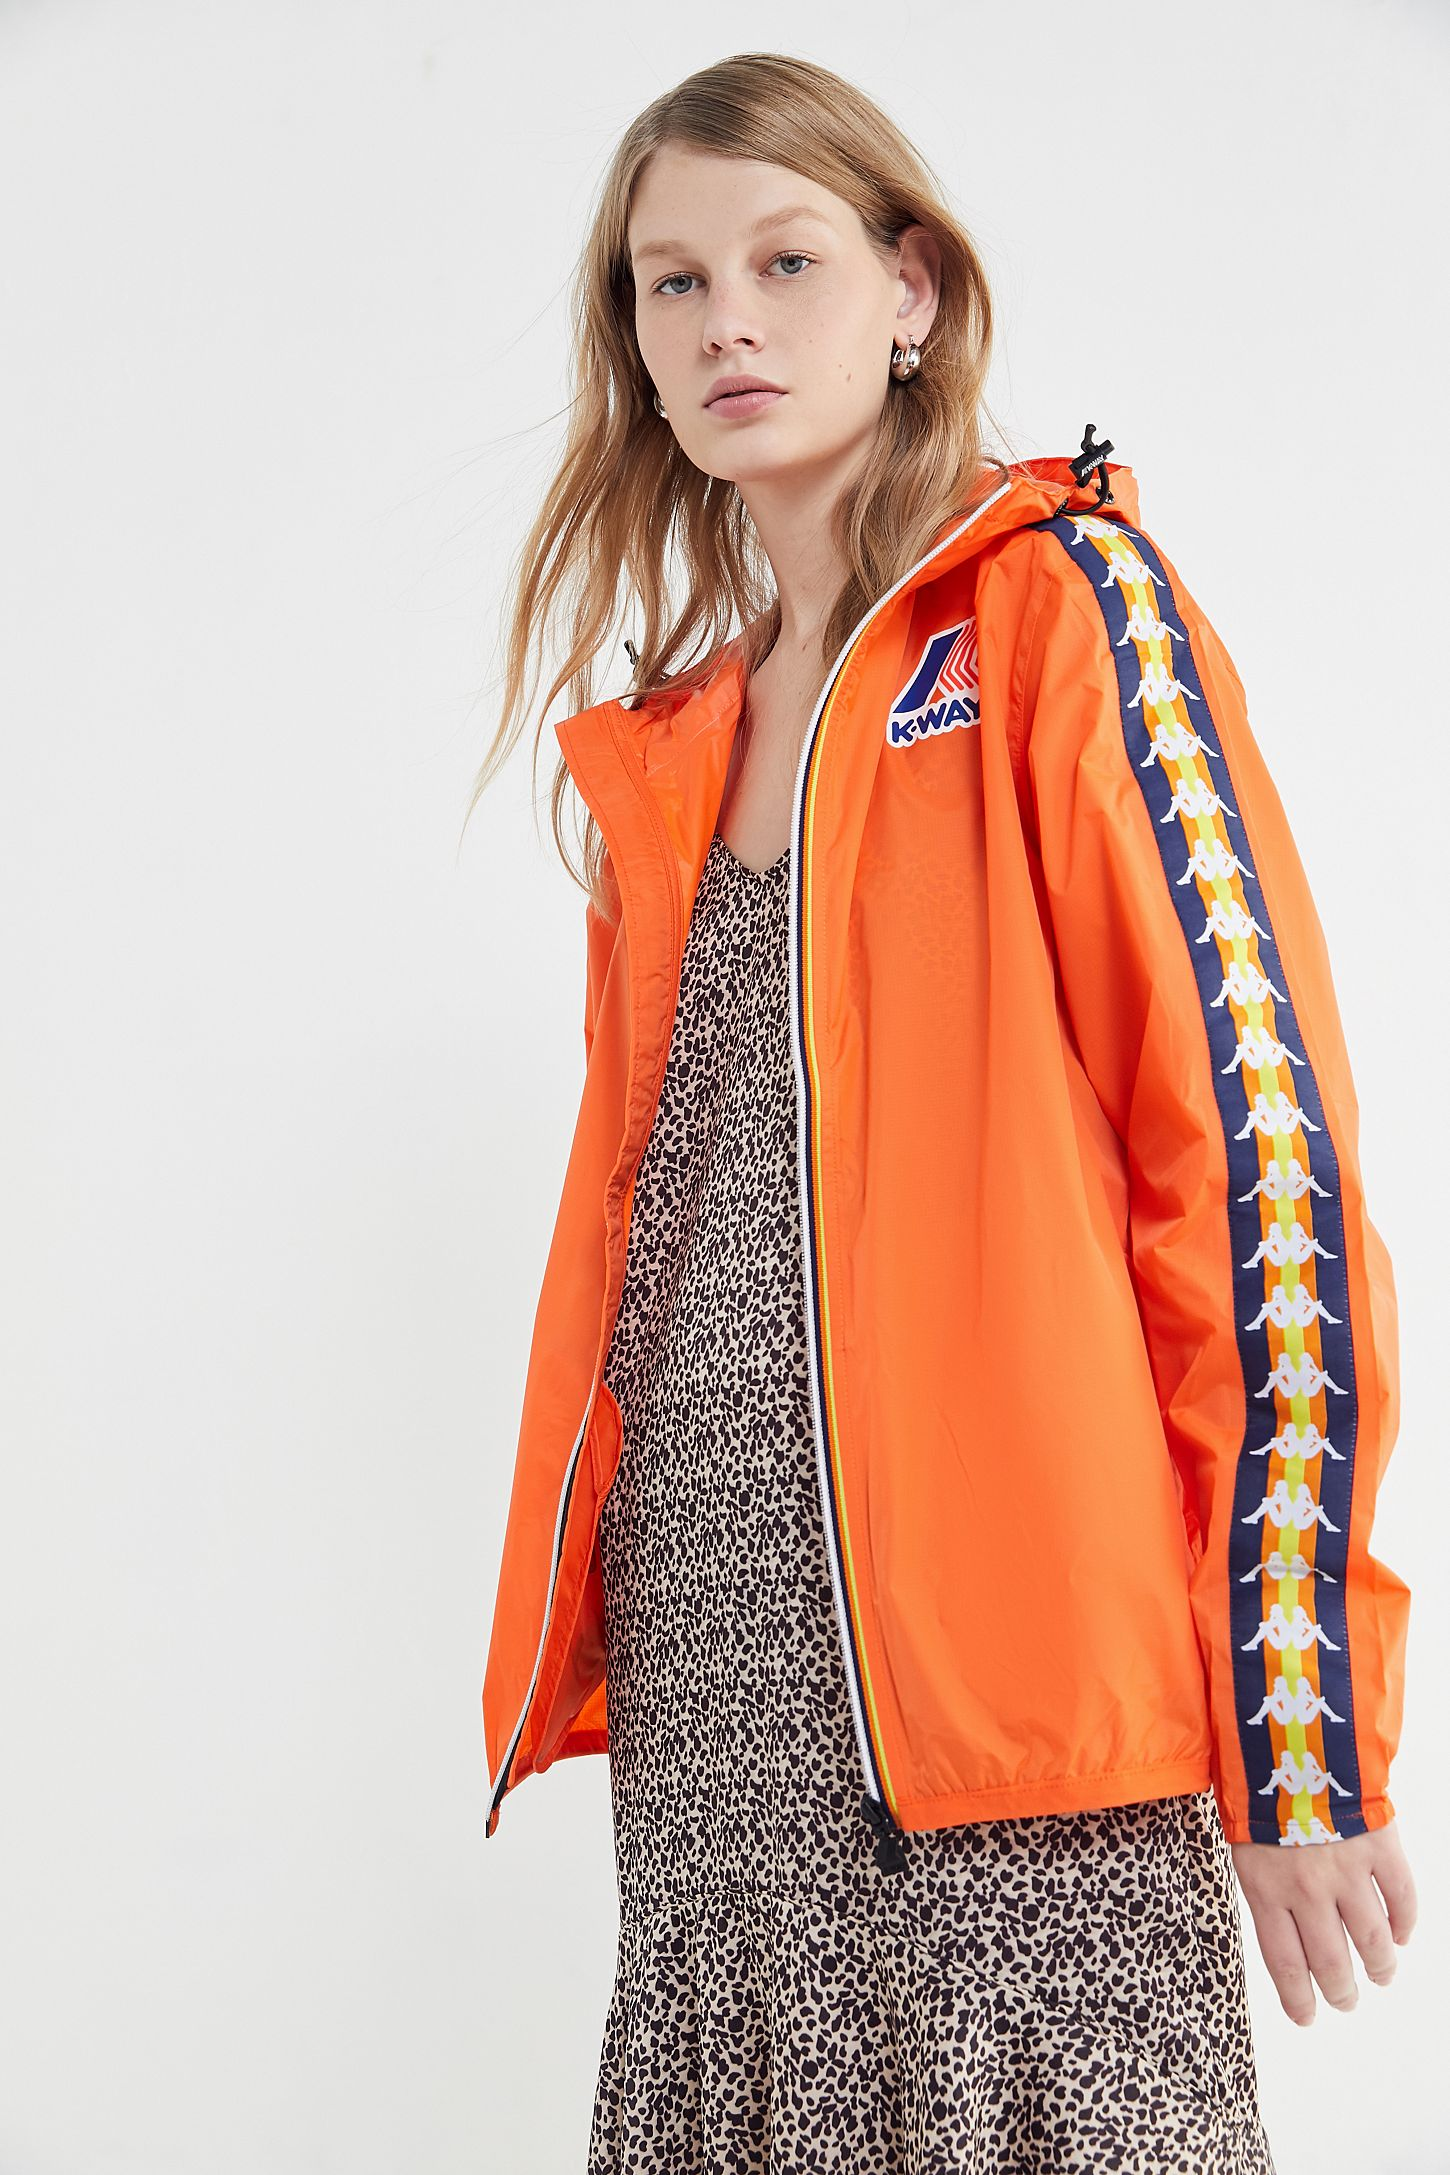 072f8f3656 Kappa X K-Way Le Vrai Claude Zip-Up Jacket